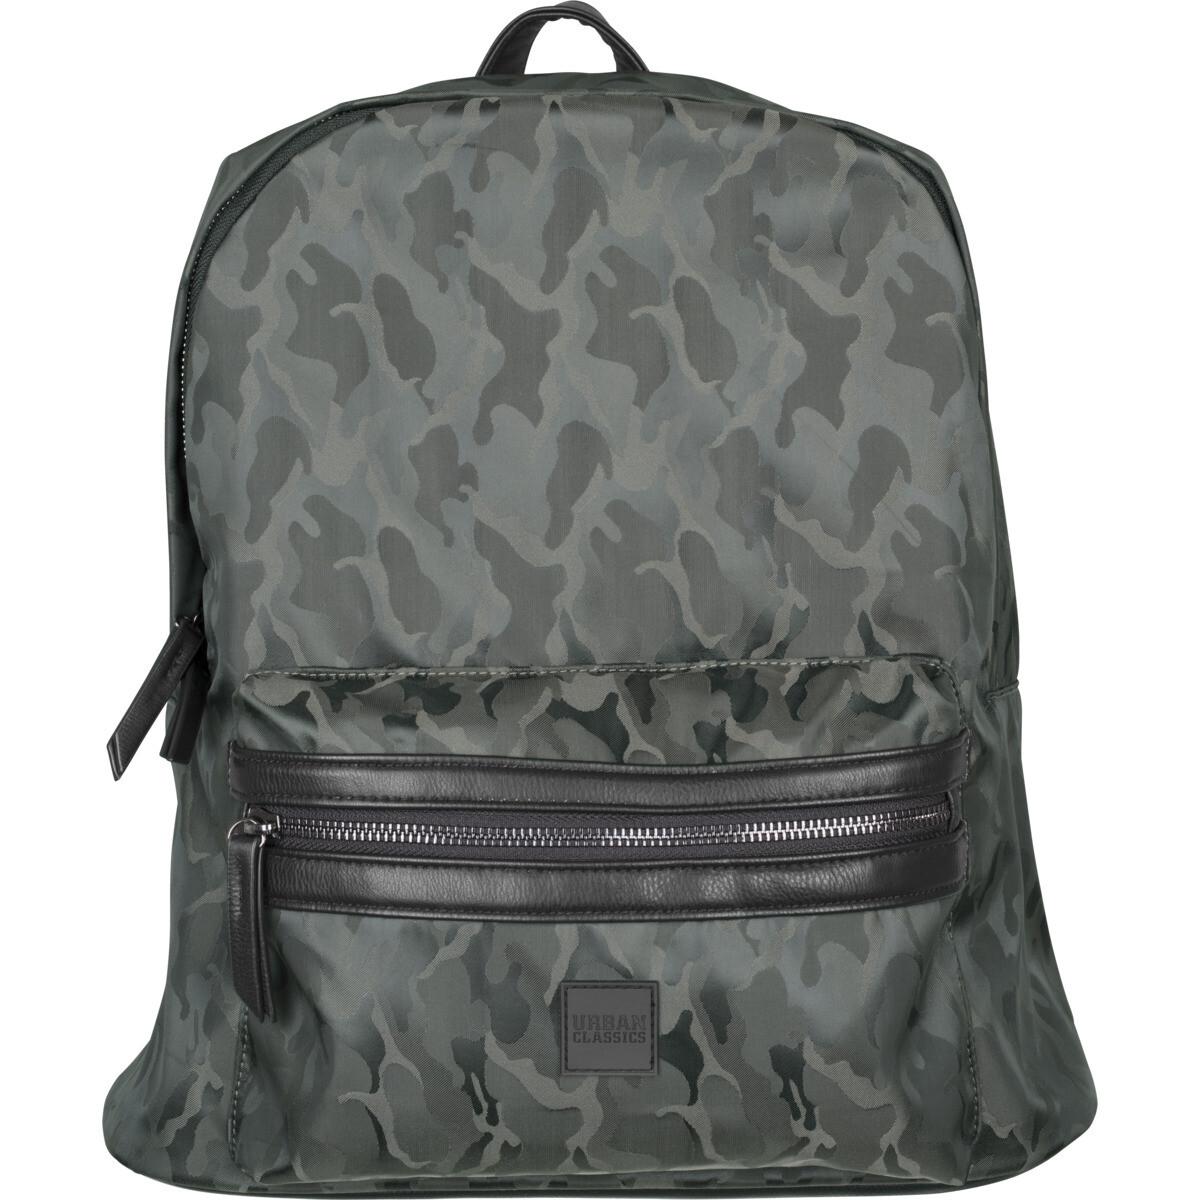 Camo Jacquard Backpack - Dunkel Olive Camo